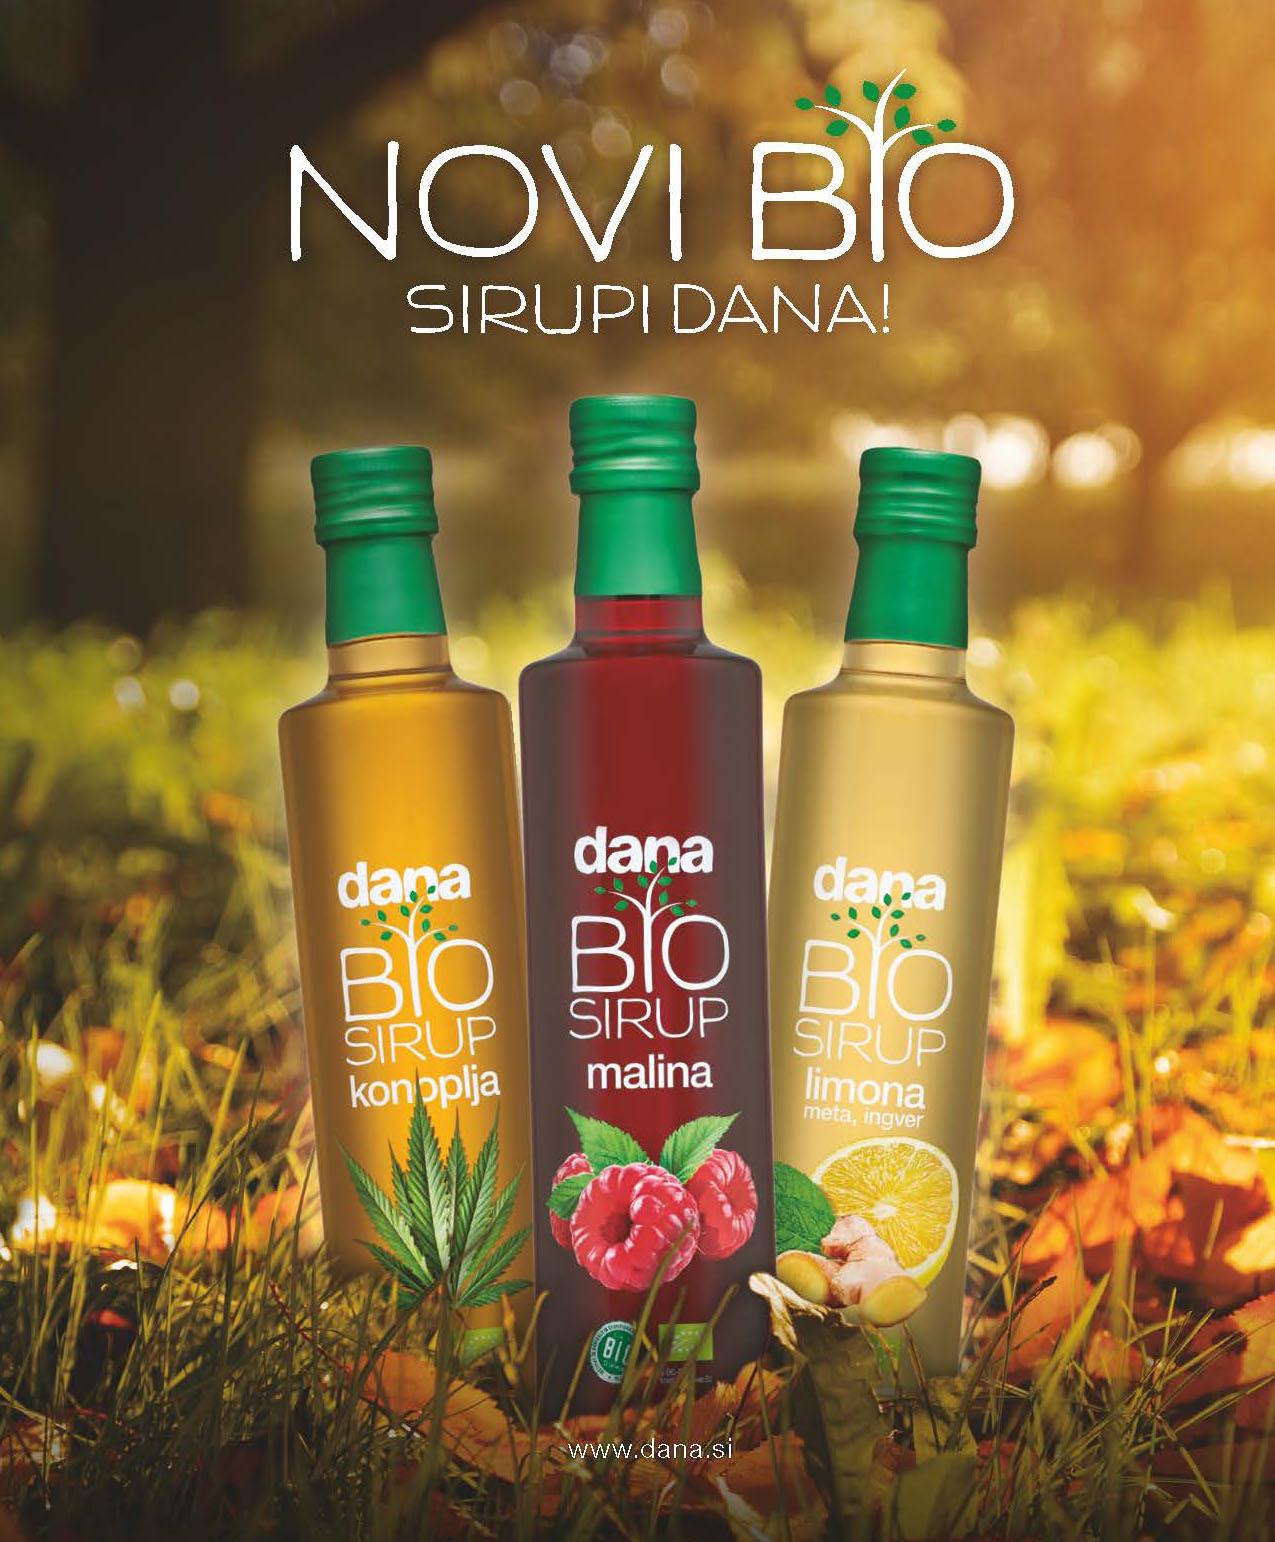 New Dana BIO syrups